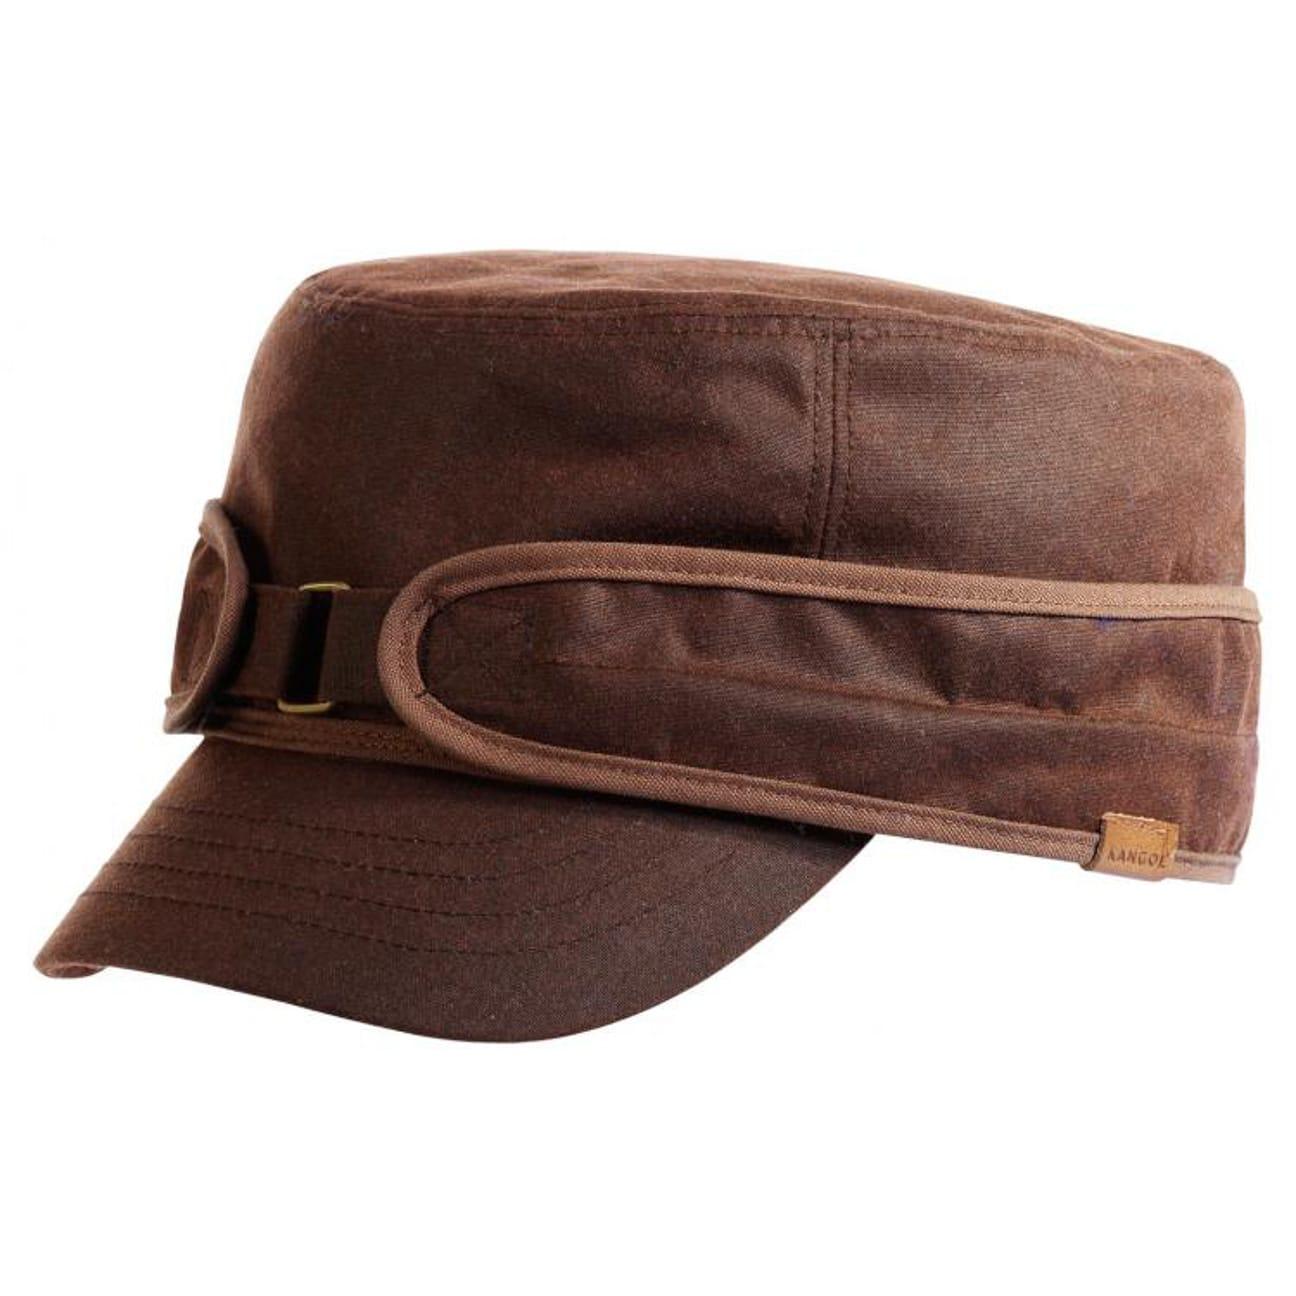 kangol wax army cap eur 5990 gt hats caps amp beanies